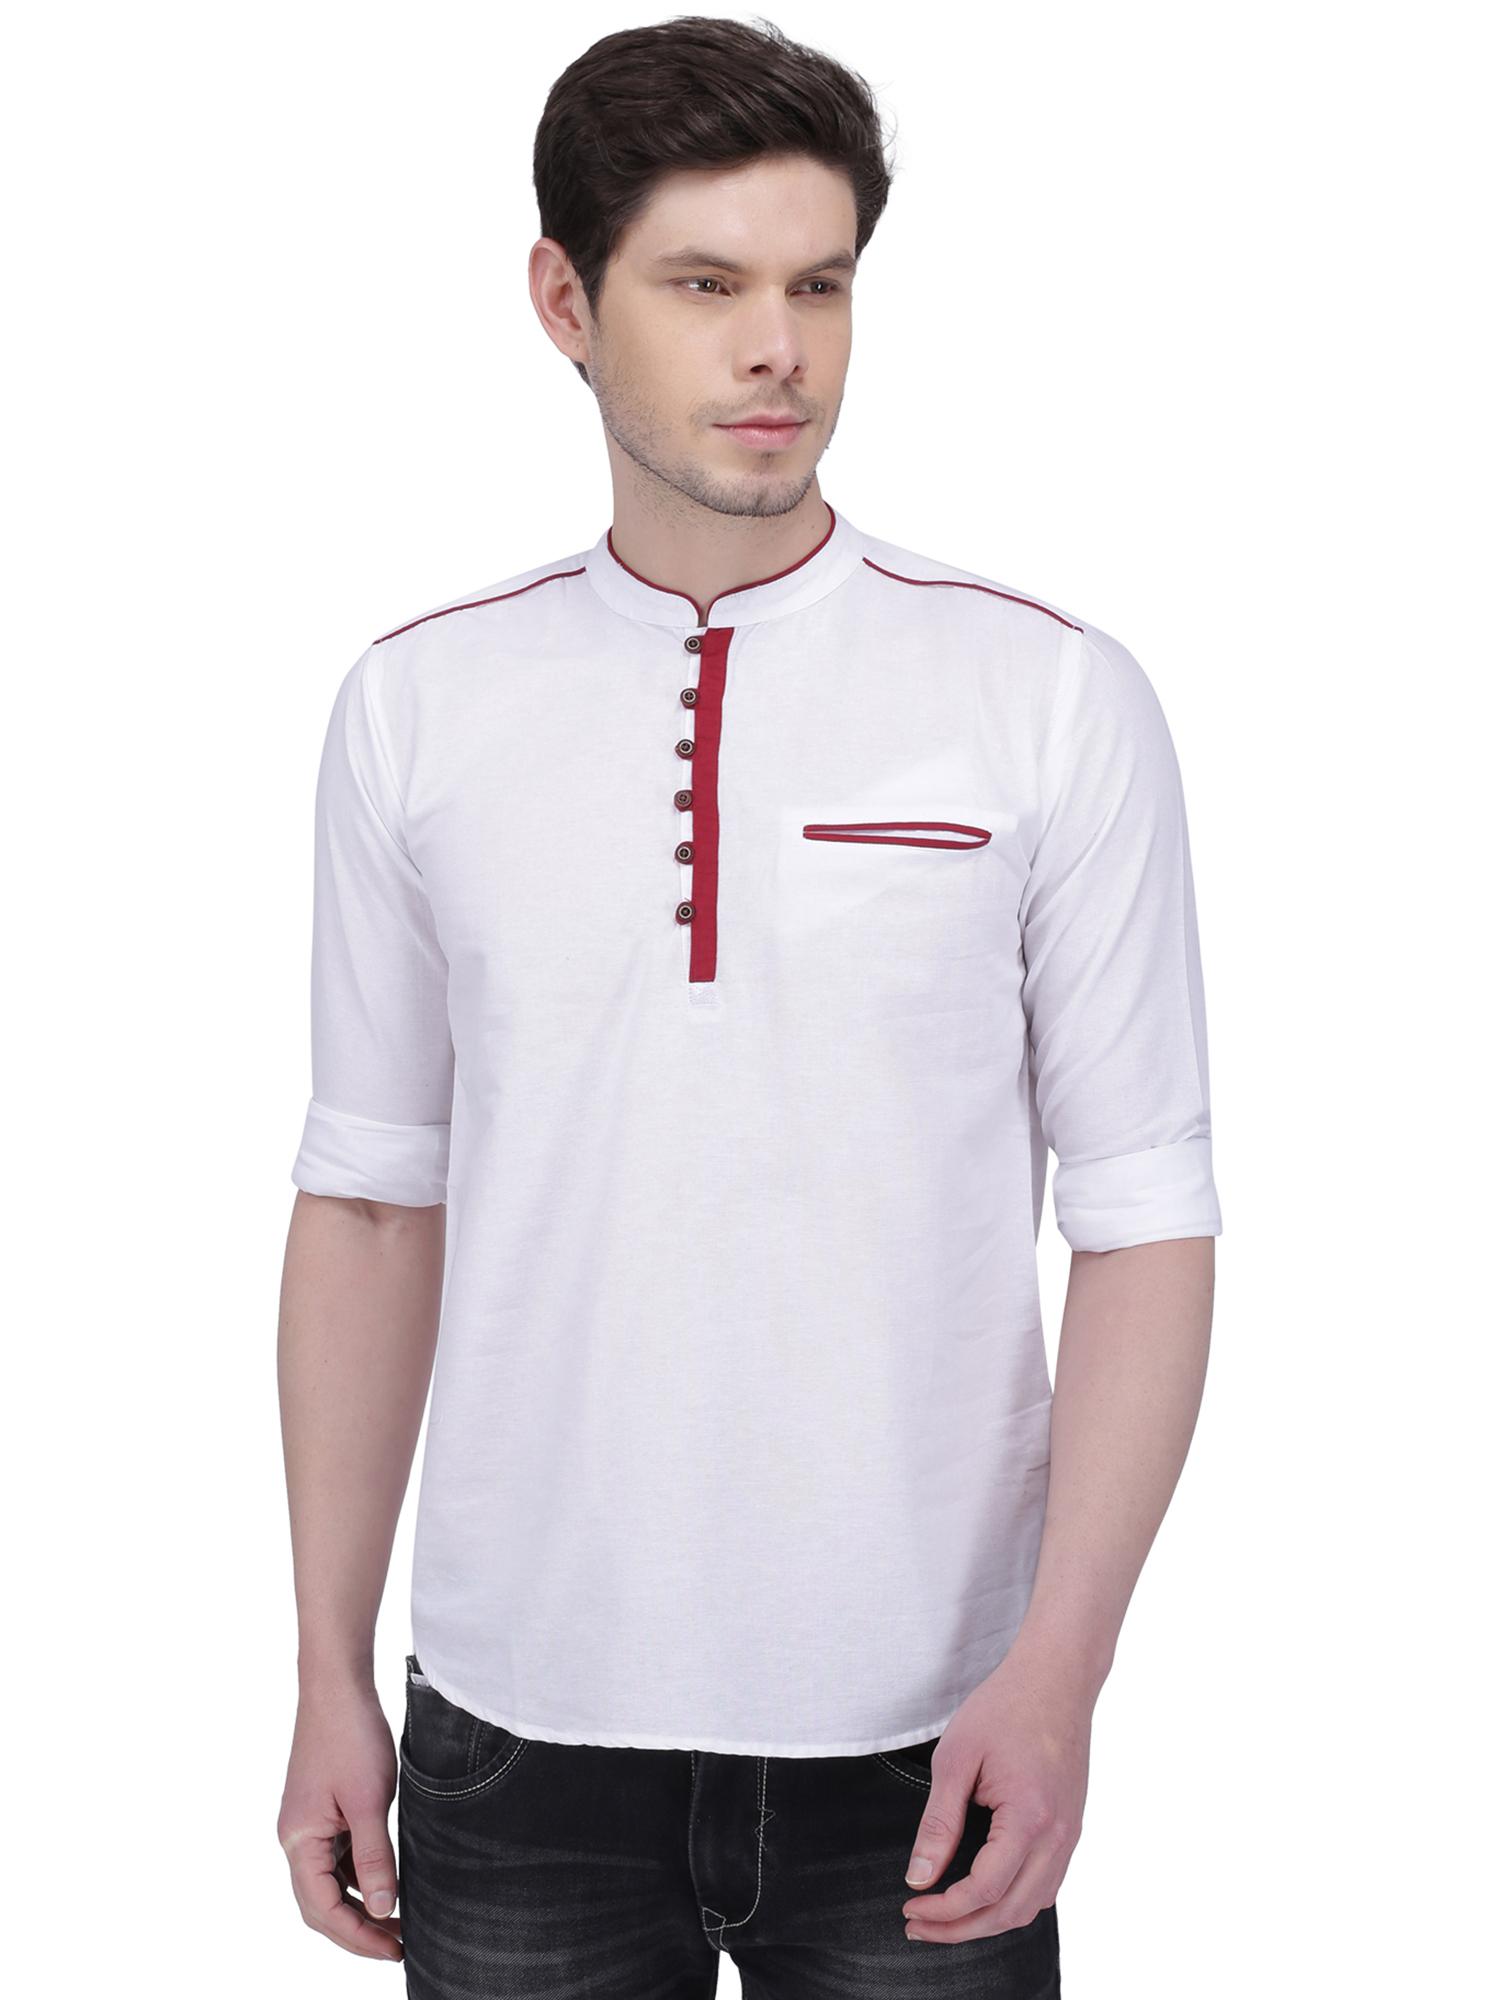 Kuons Avenue | Kuons Avenue Men's White Linen Cotton Short Kurta- KACLFS1153WH